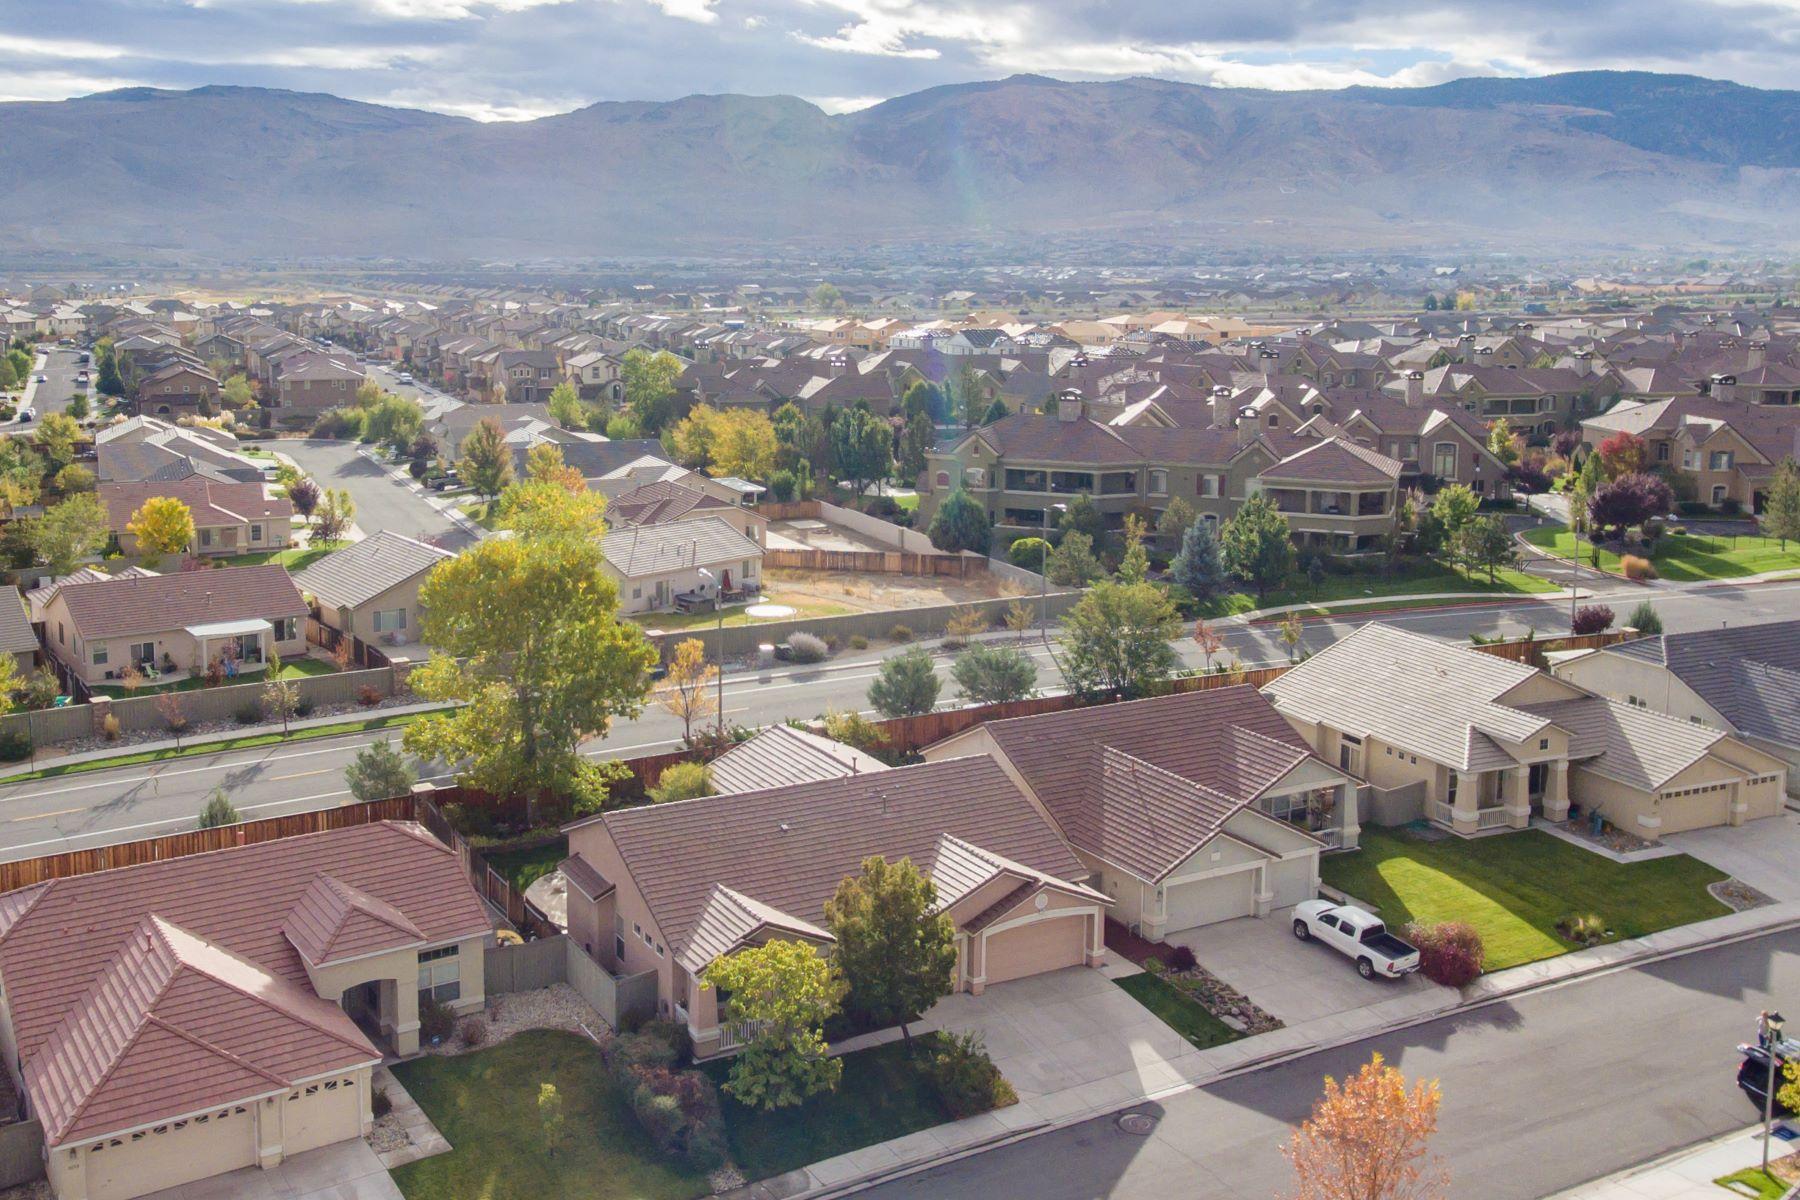 Additional photo for property listing at 9960 Frankwood Drive 9660 Frankwood Drive Reno, Nevada 89521 United States